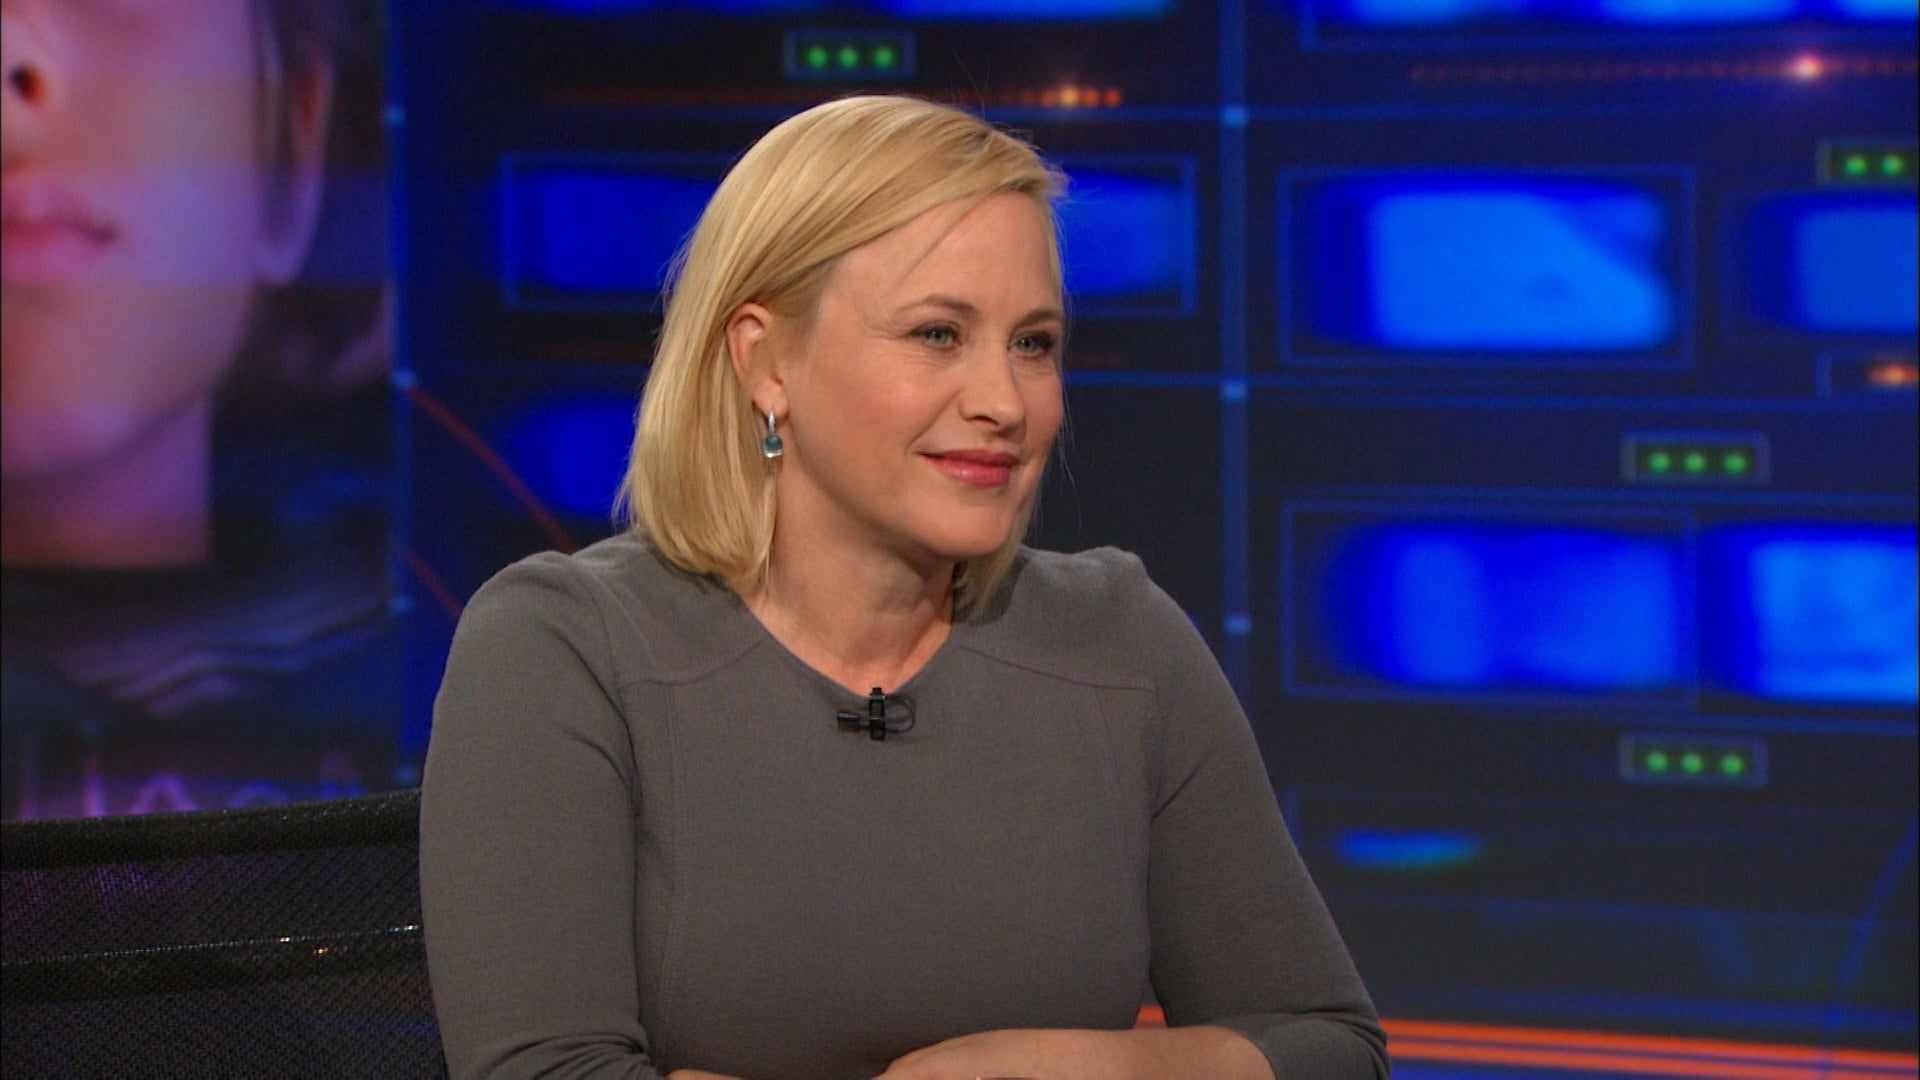 The Daily Show with Trevor Noah Season 20 :Episode 61  Patricia Arquette